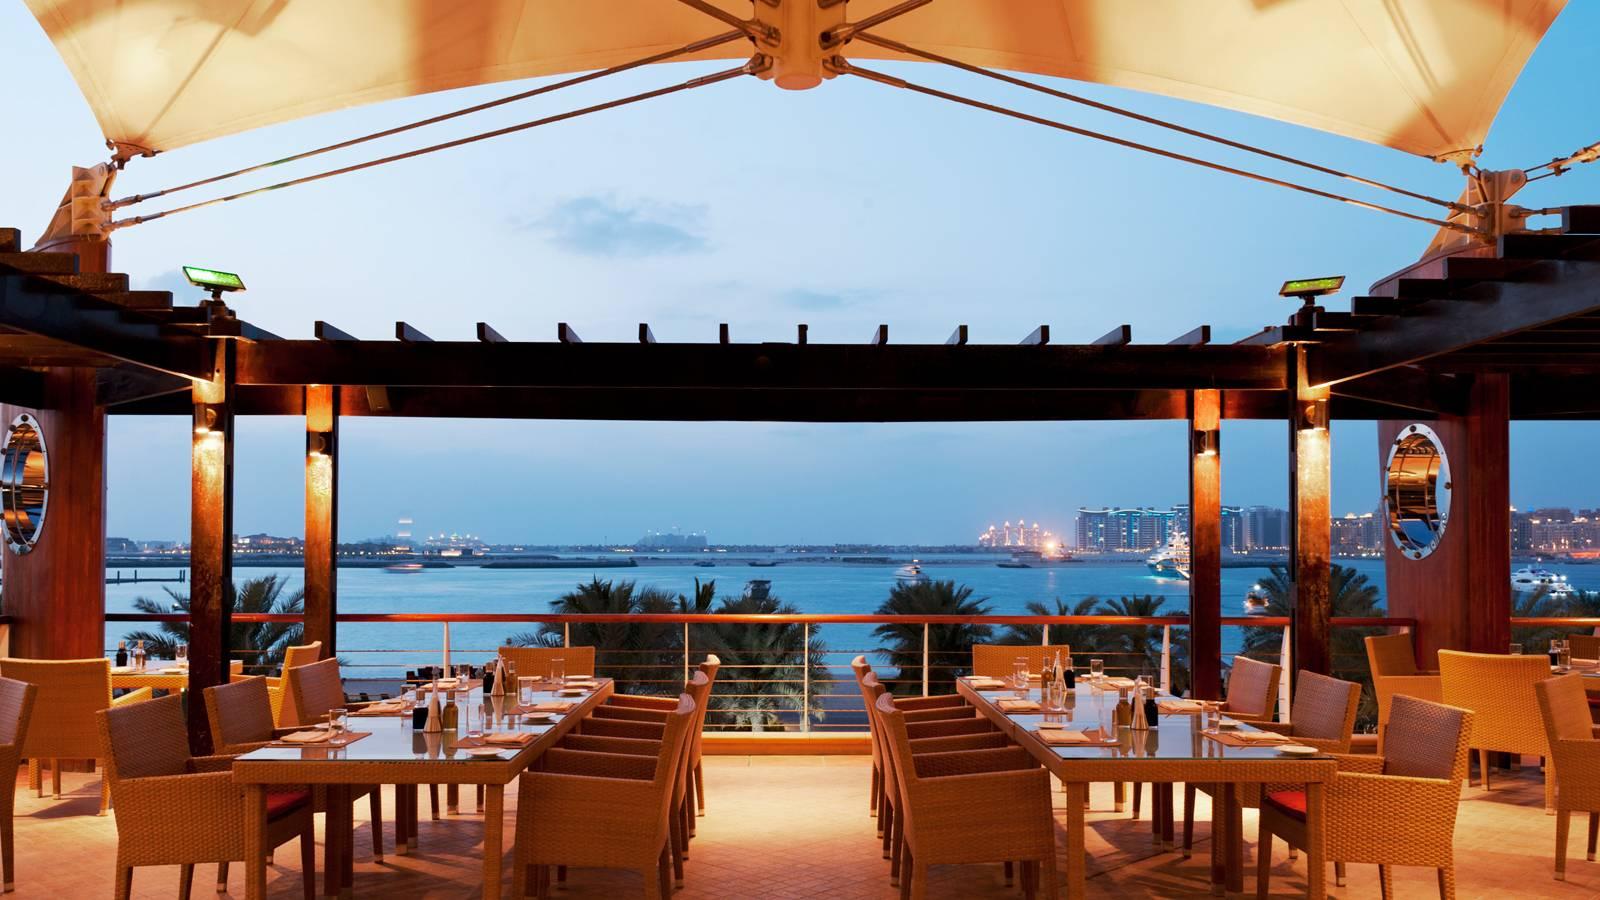 Bussola-DubaiItalianRestaurant-TheWestinDubaiMinaSeyahi